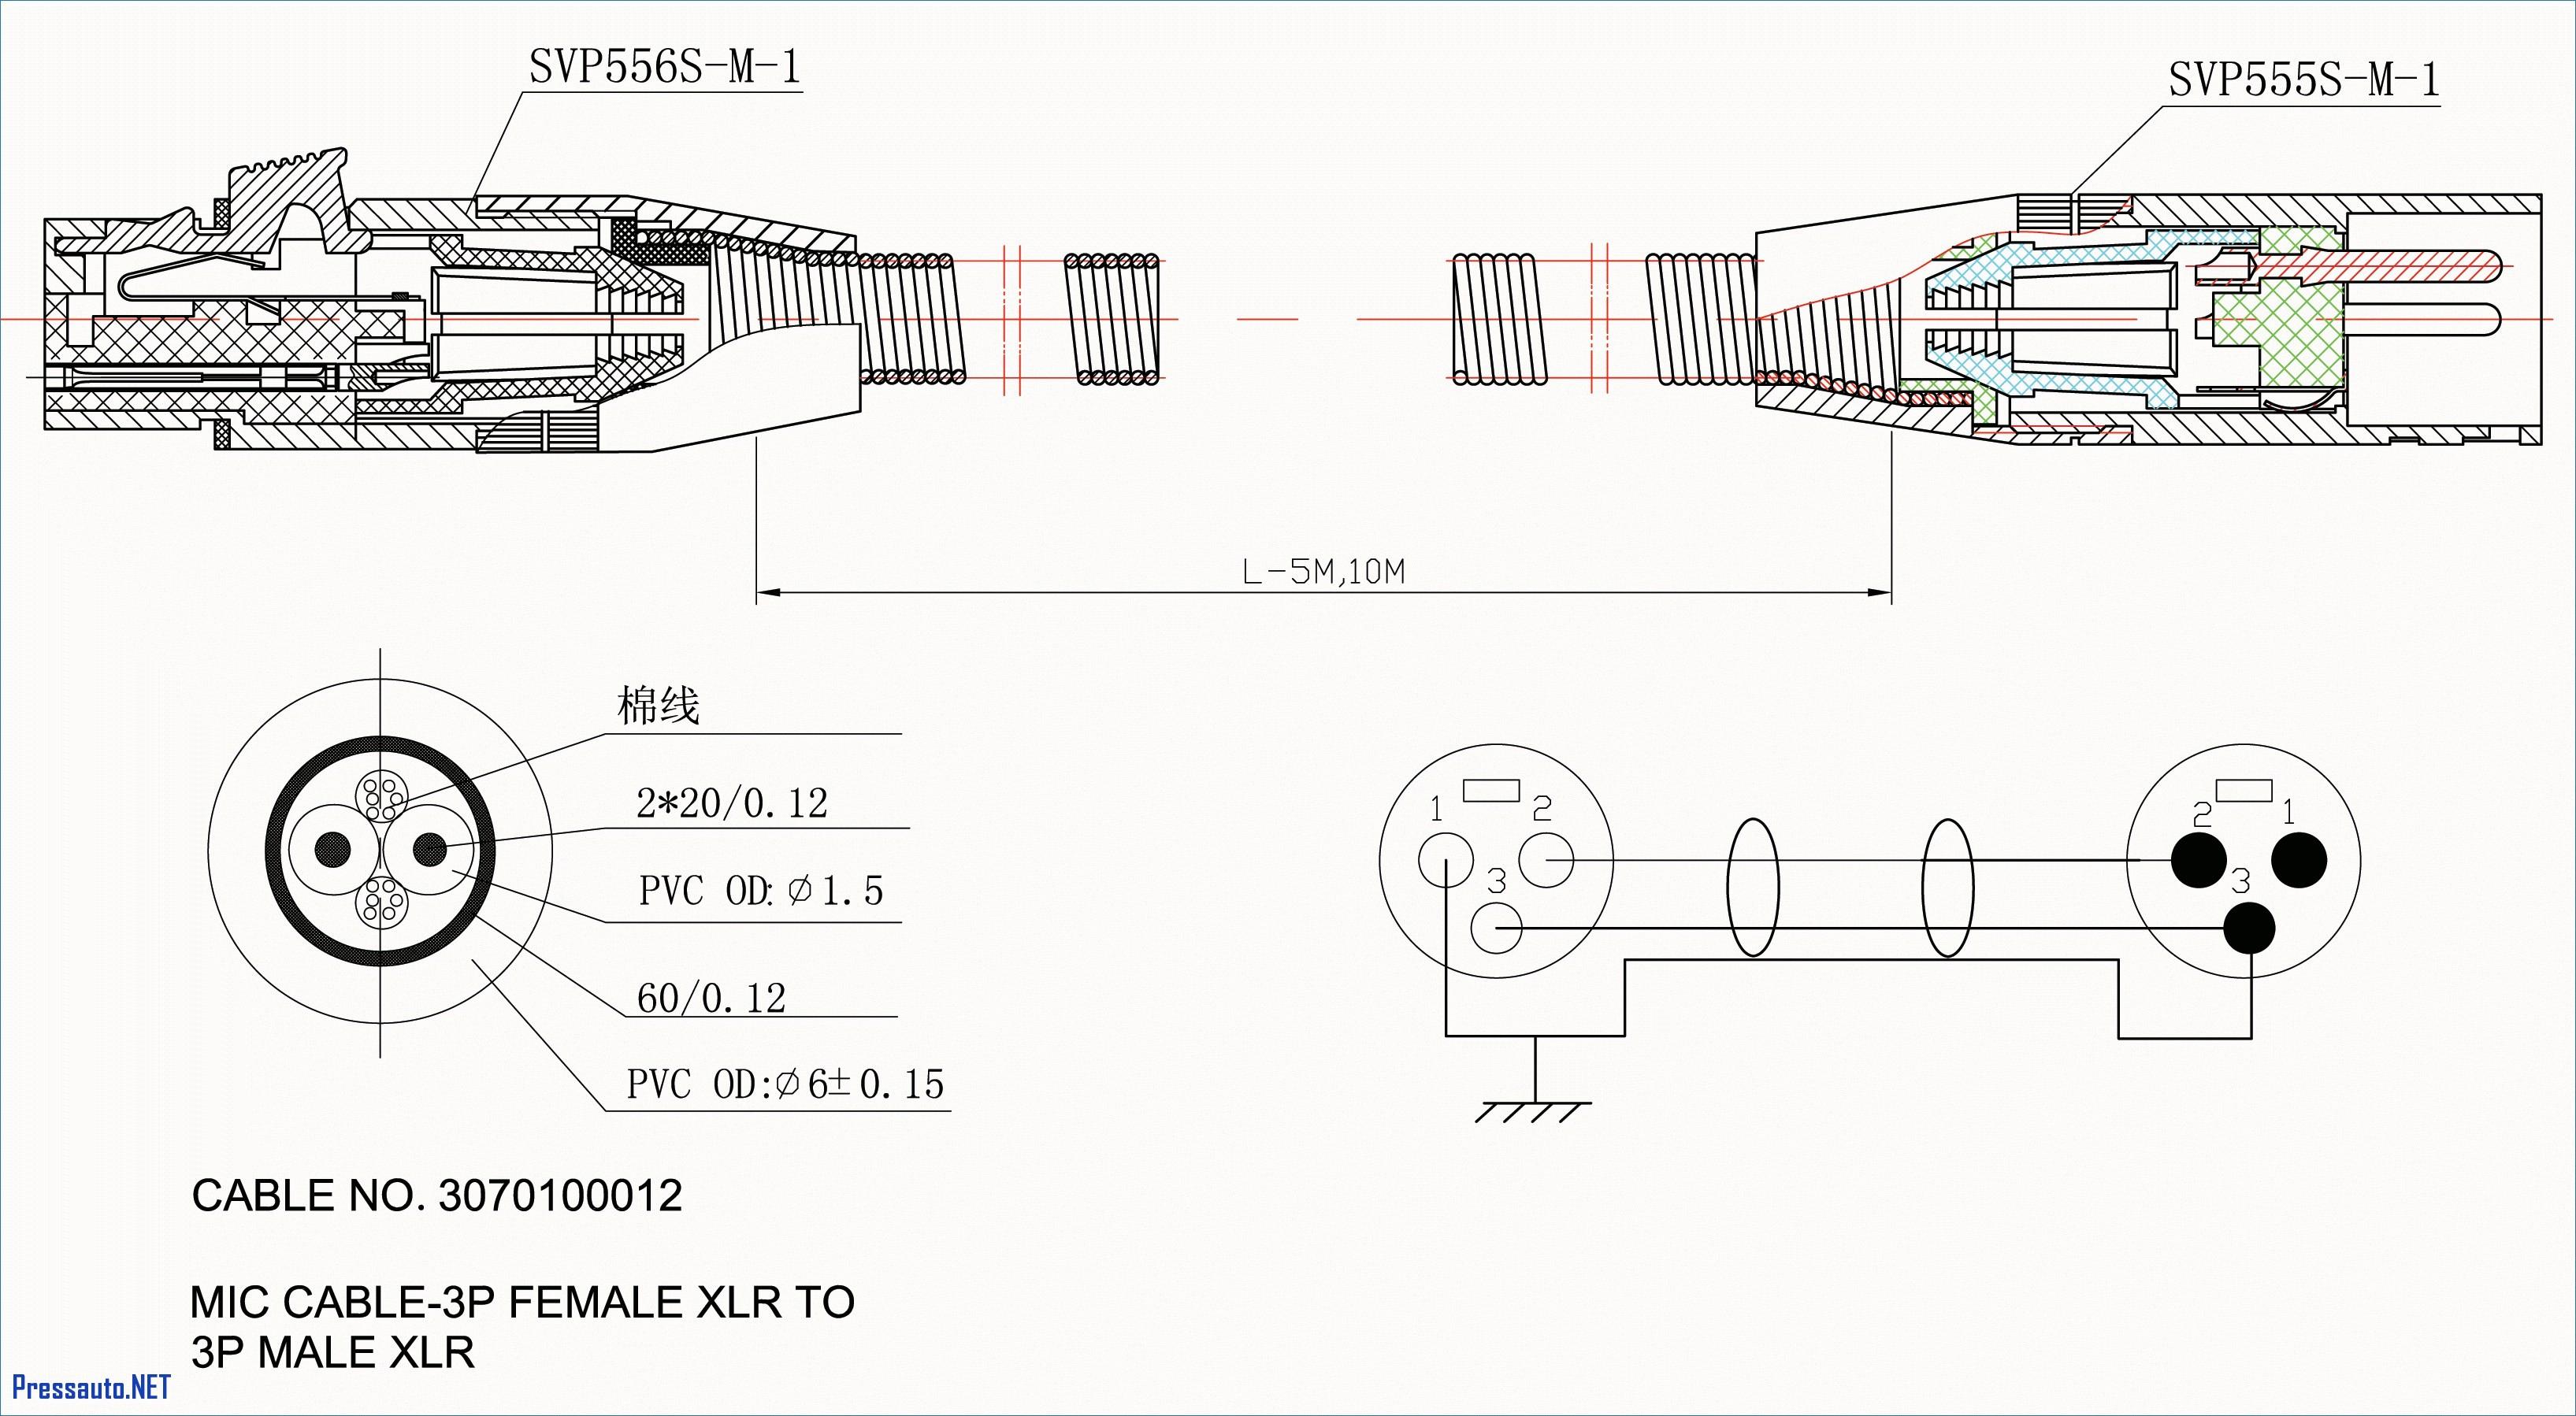 C4500 Wiring Diagram Schemes Silverado Usb Port Blower Motor Detailed Schematic Diagrams Rh 4rmotorsports Com 2002 Gmc